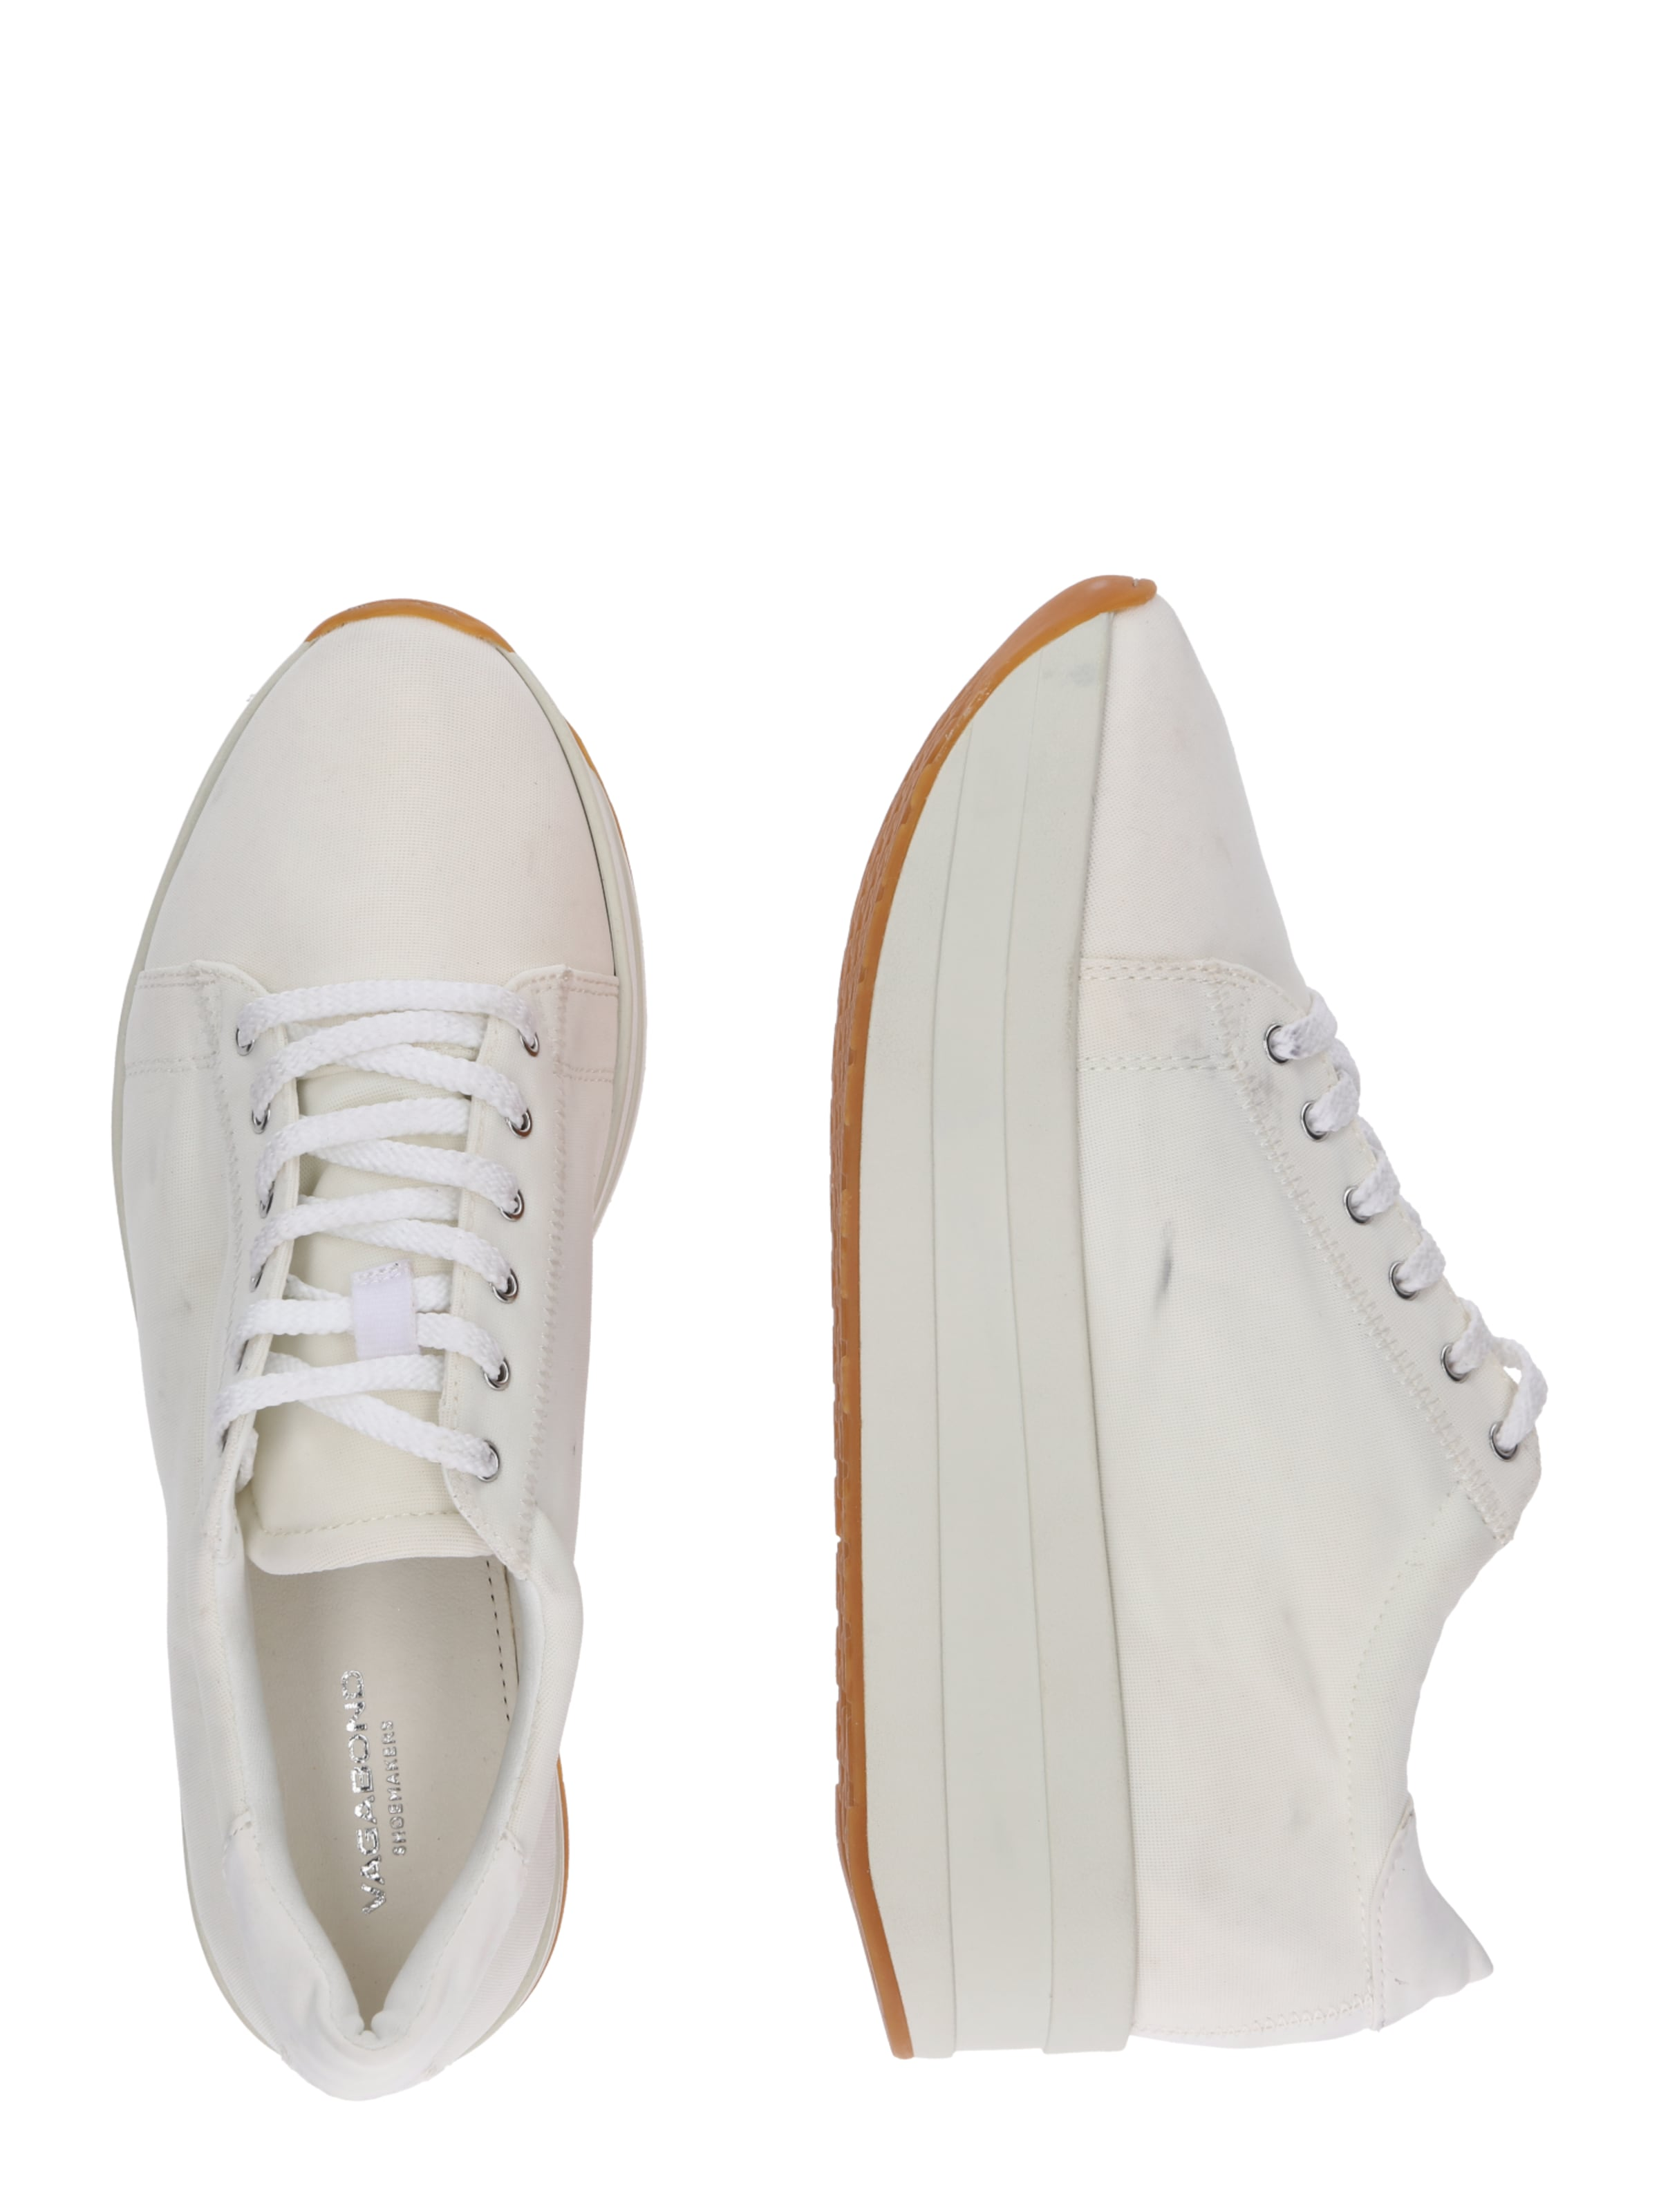 Vagabond Weiß Vagabond Shoemakers Sneaker Sneaker Shoemakers In PXiTZOuk